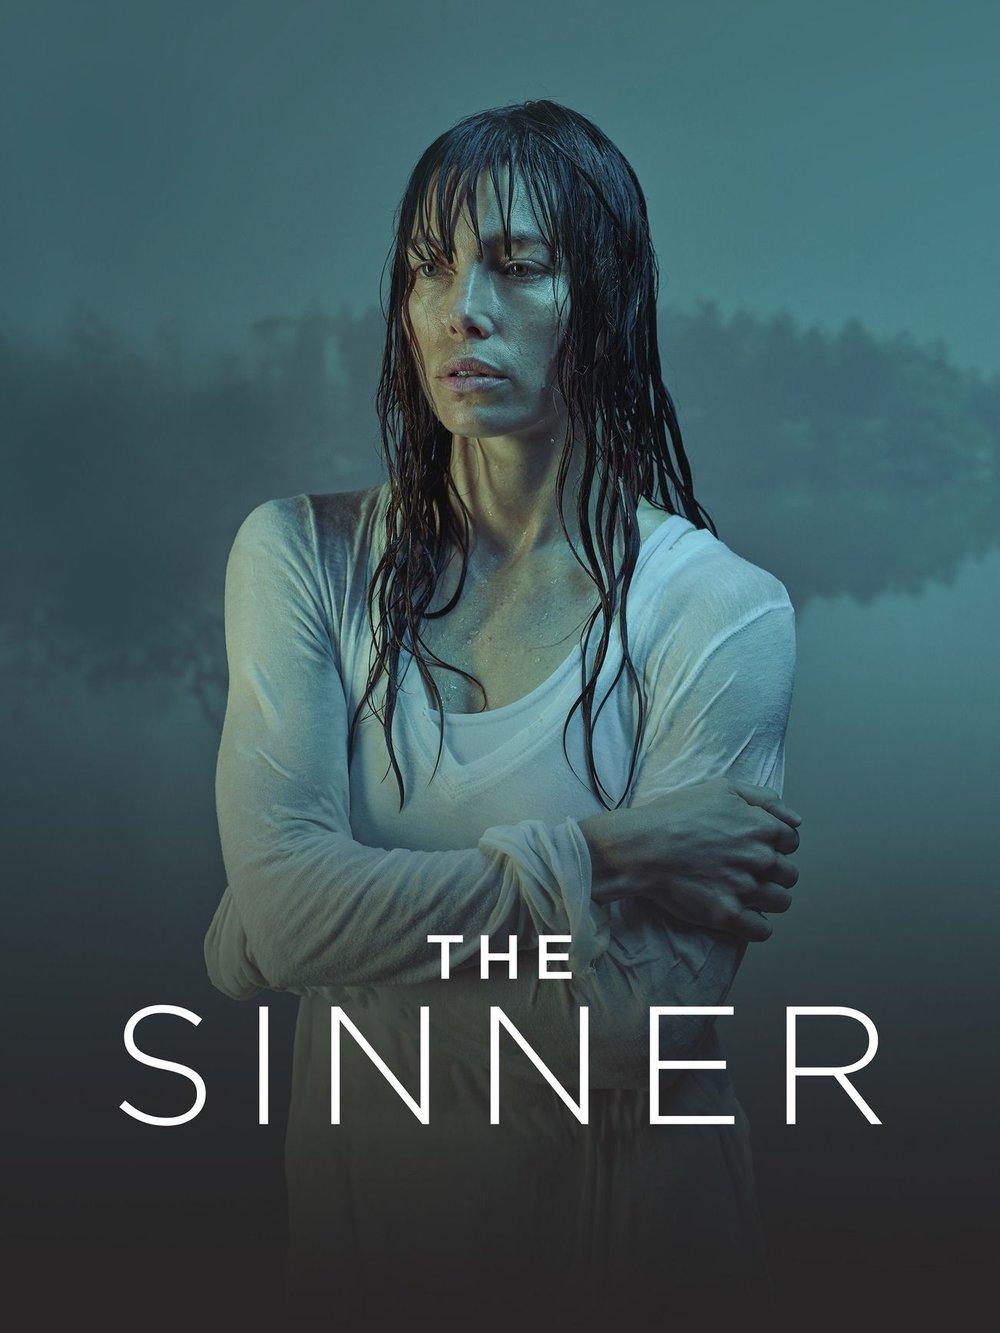 THE SINNER - The Grown Up Edit.jpg